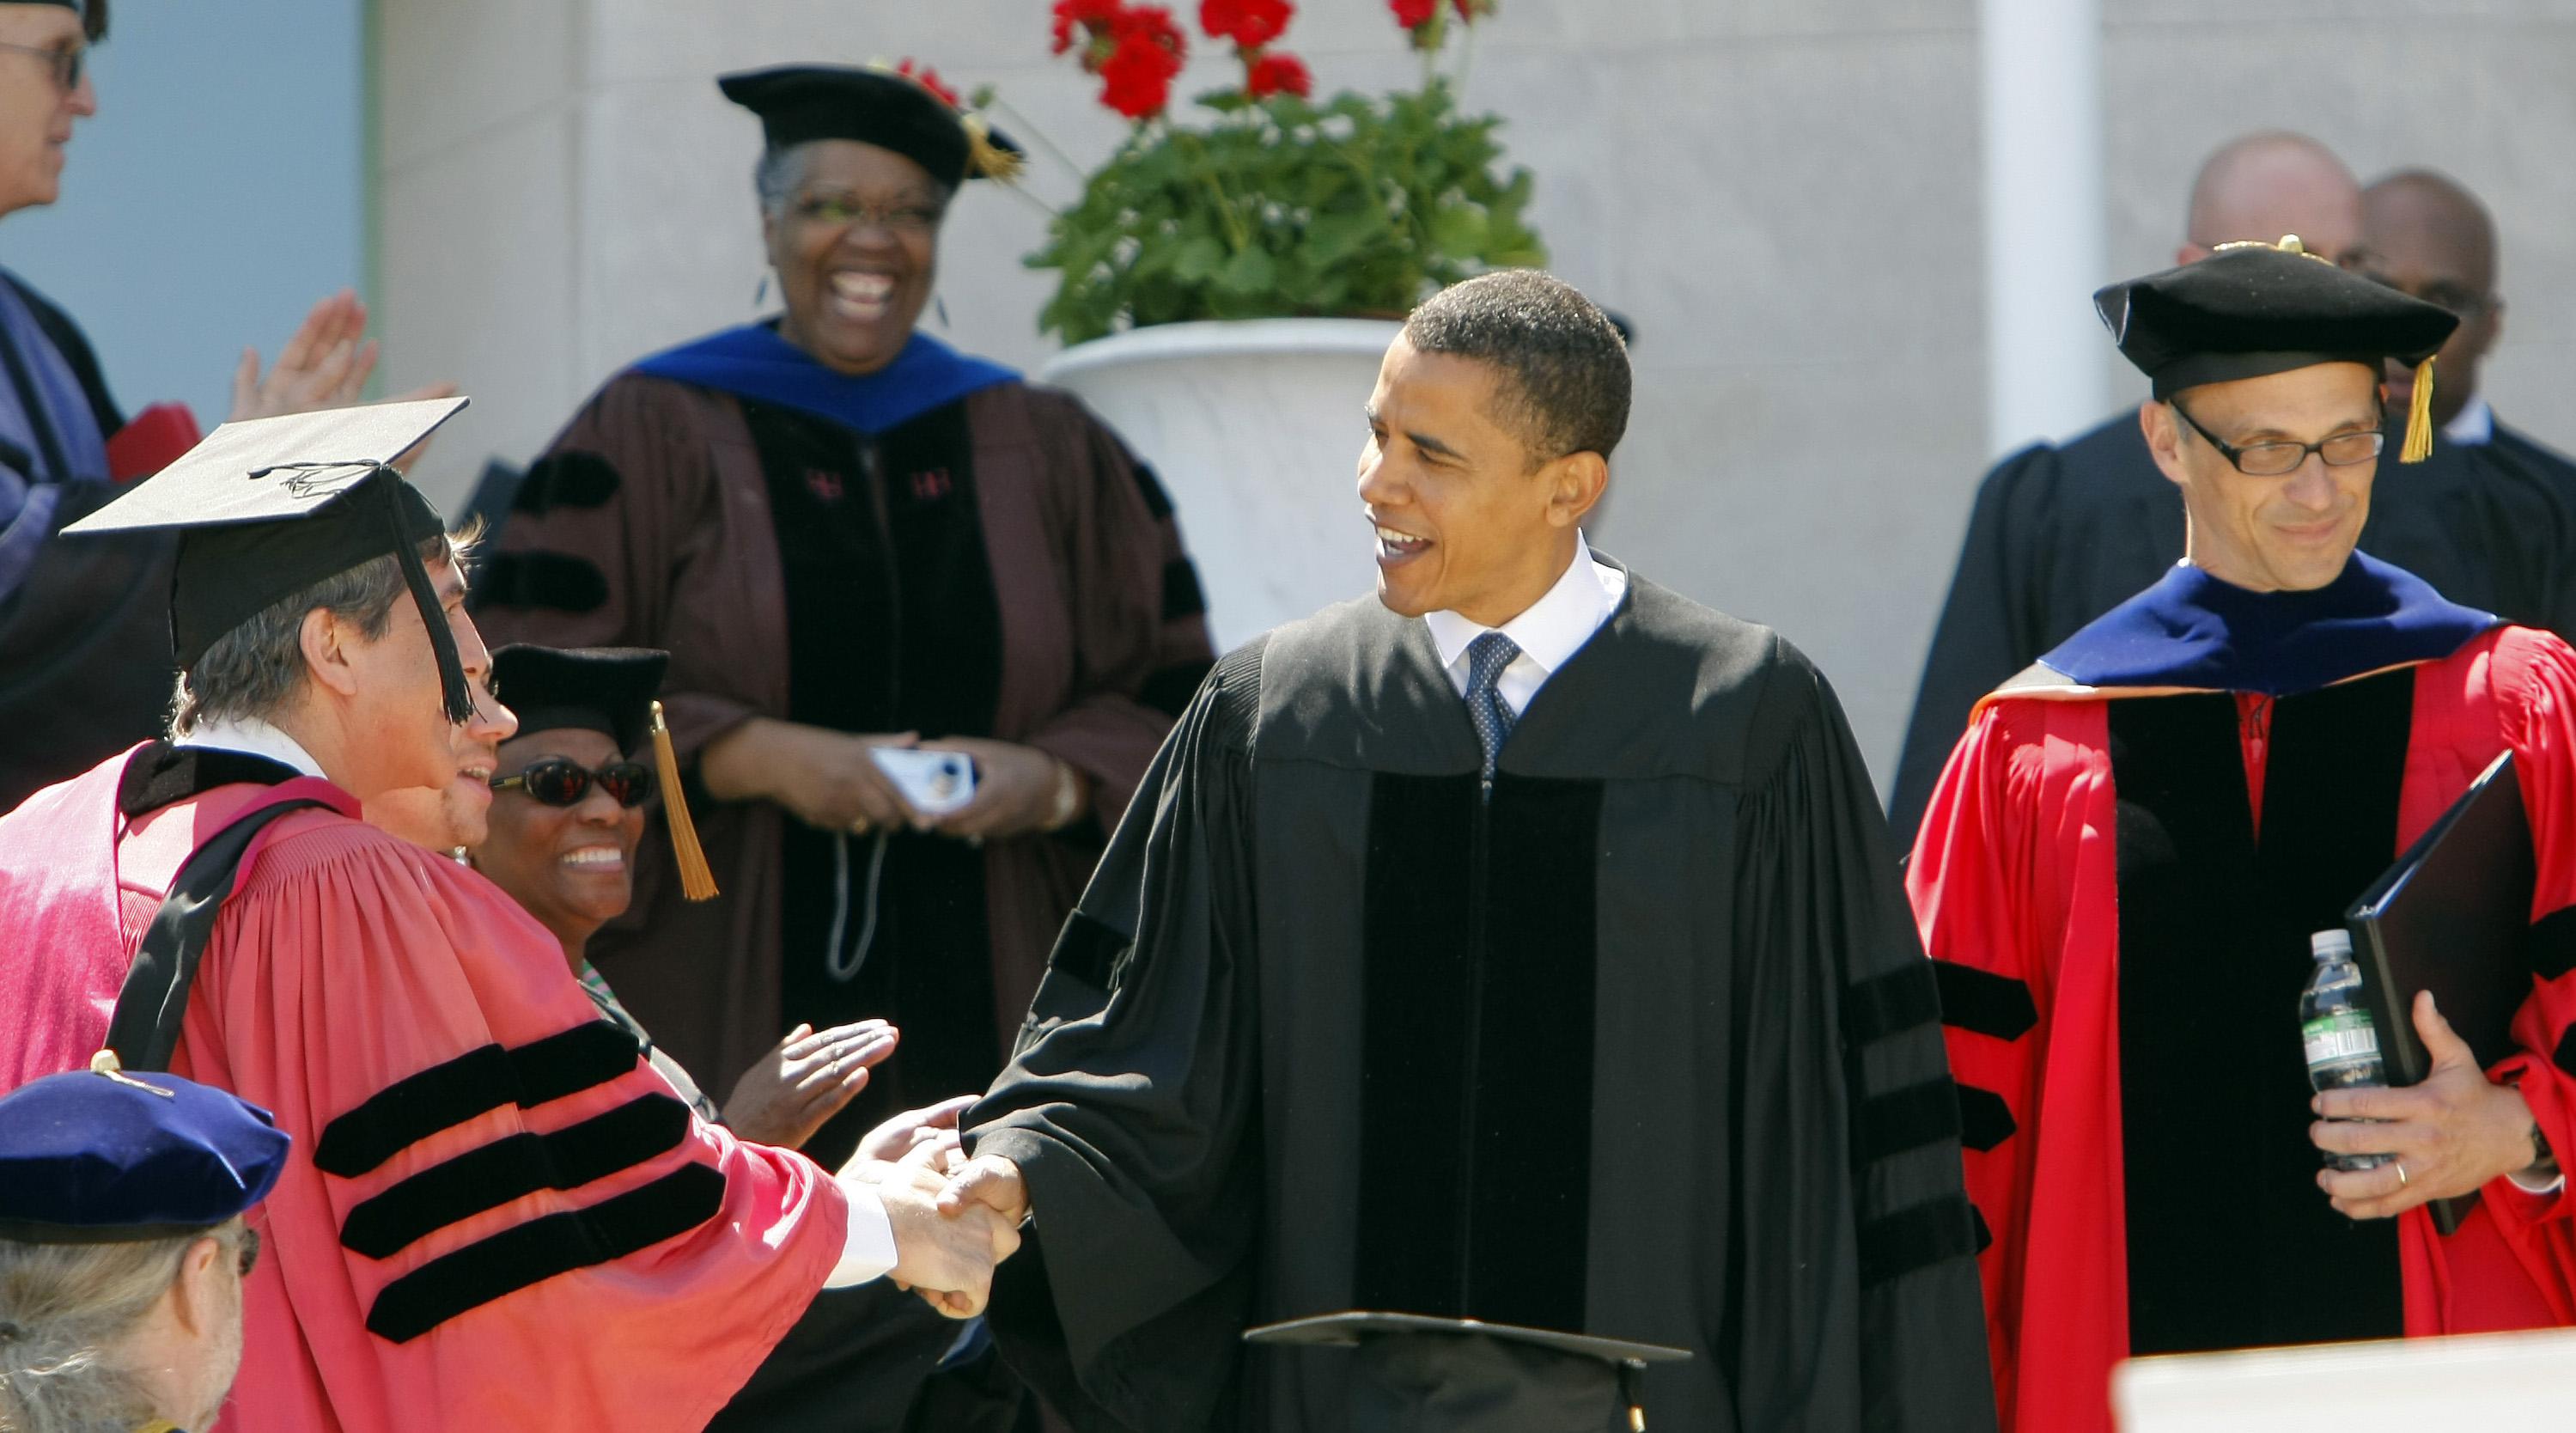 Obama addresses graduates at Wesleyan University in Middletown